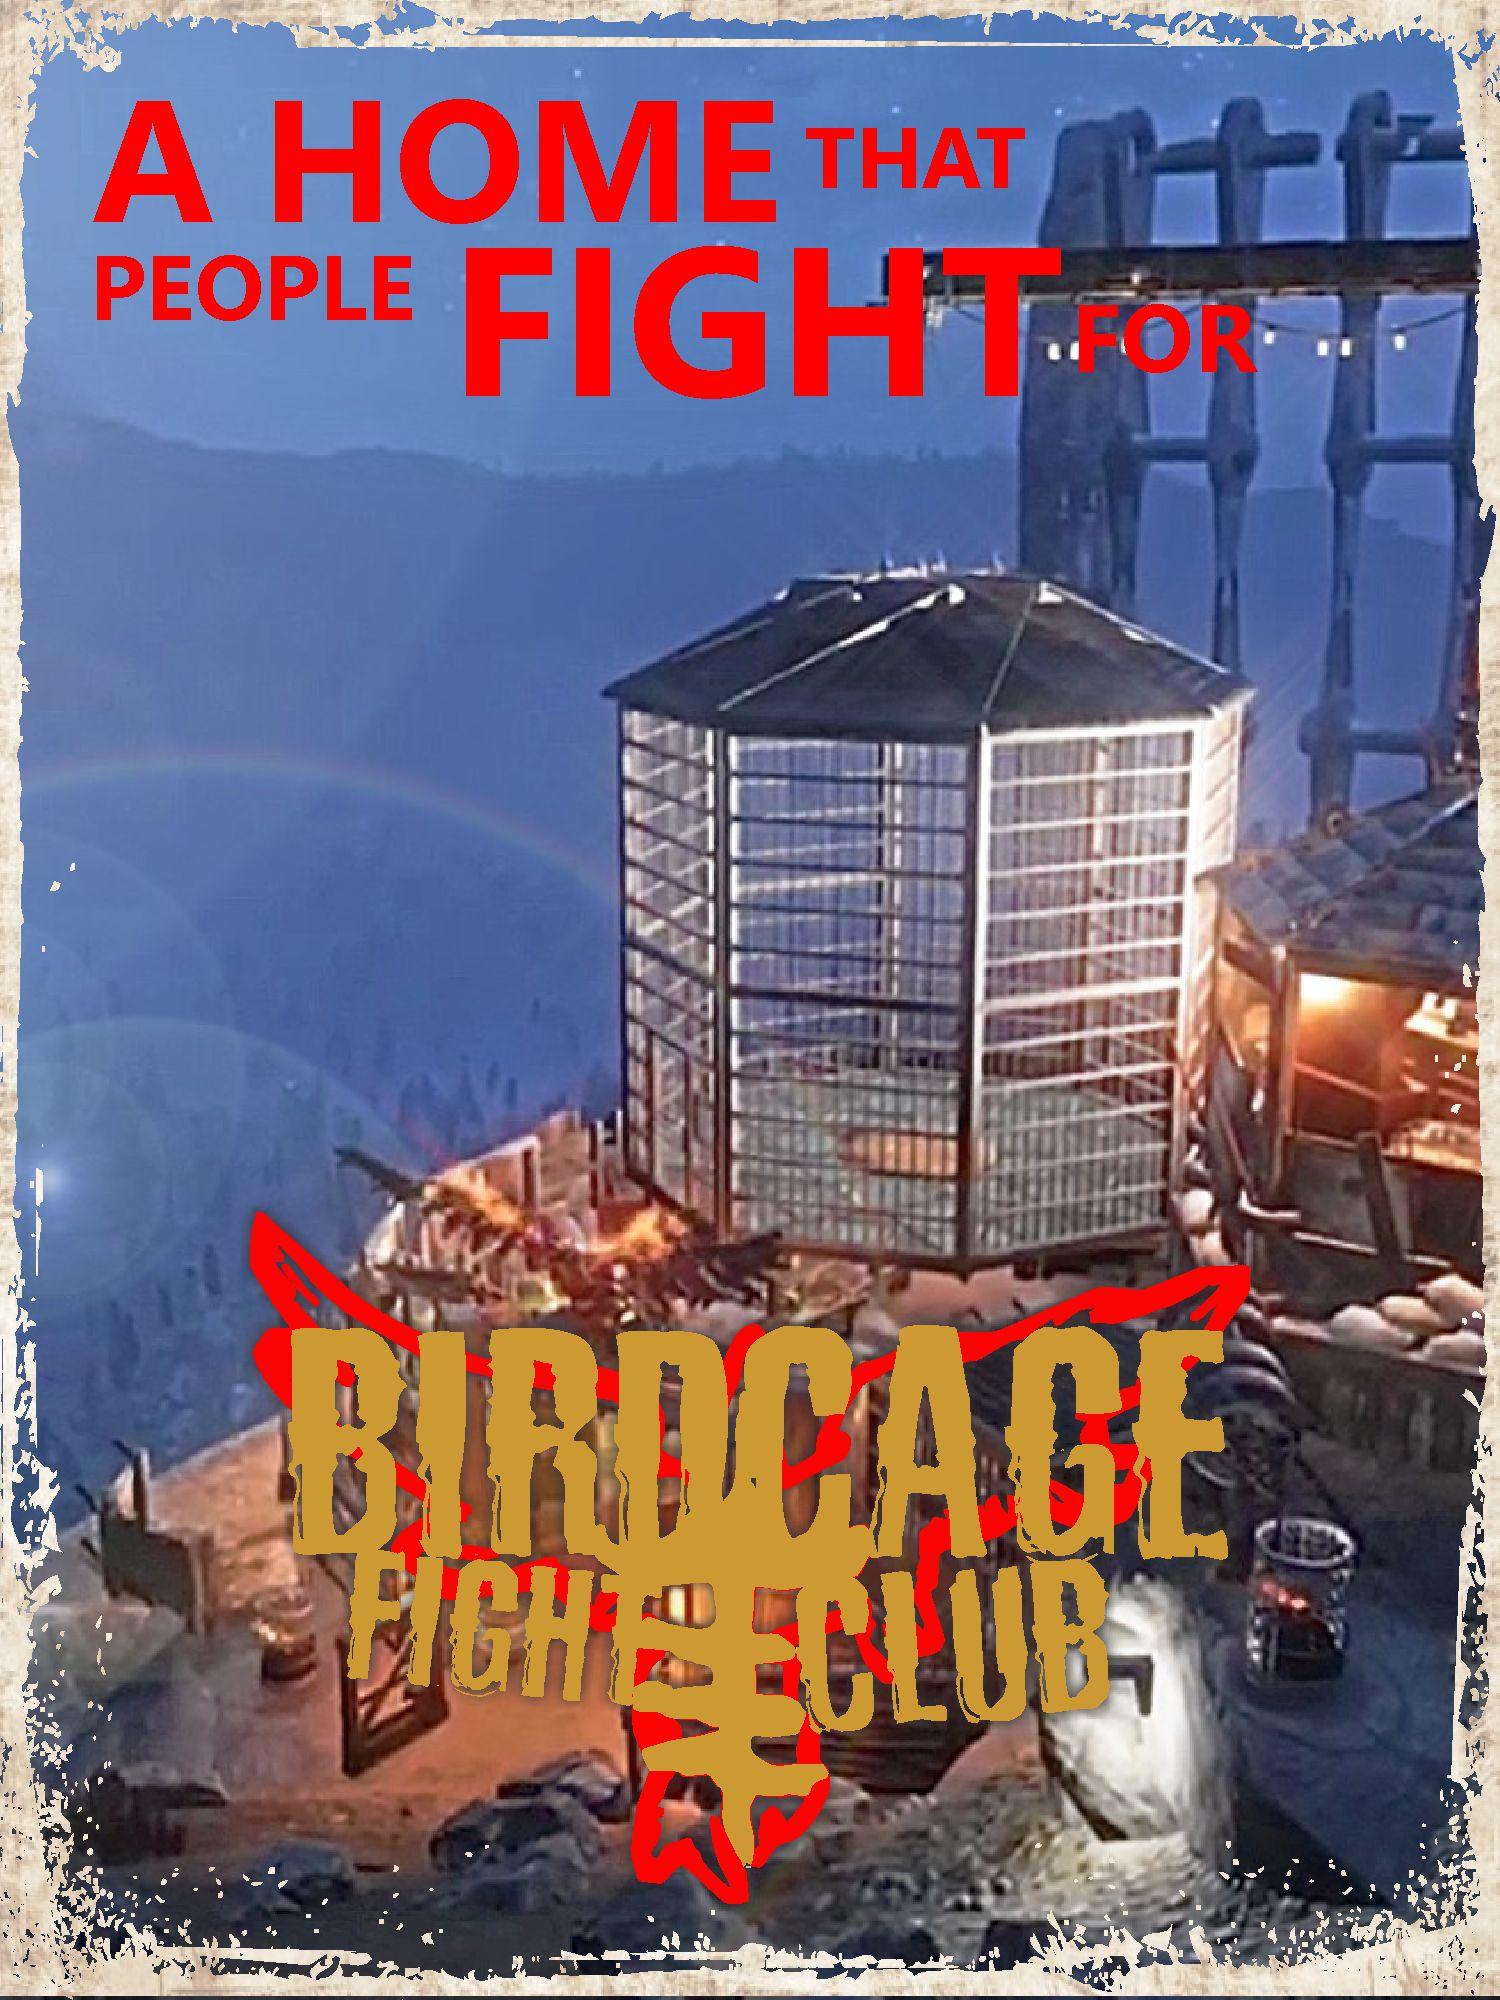 Birdcage Fight Club